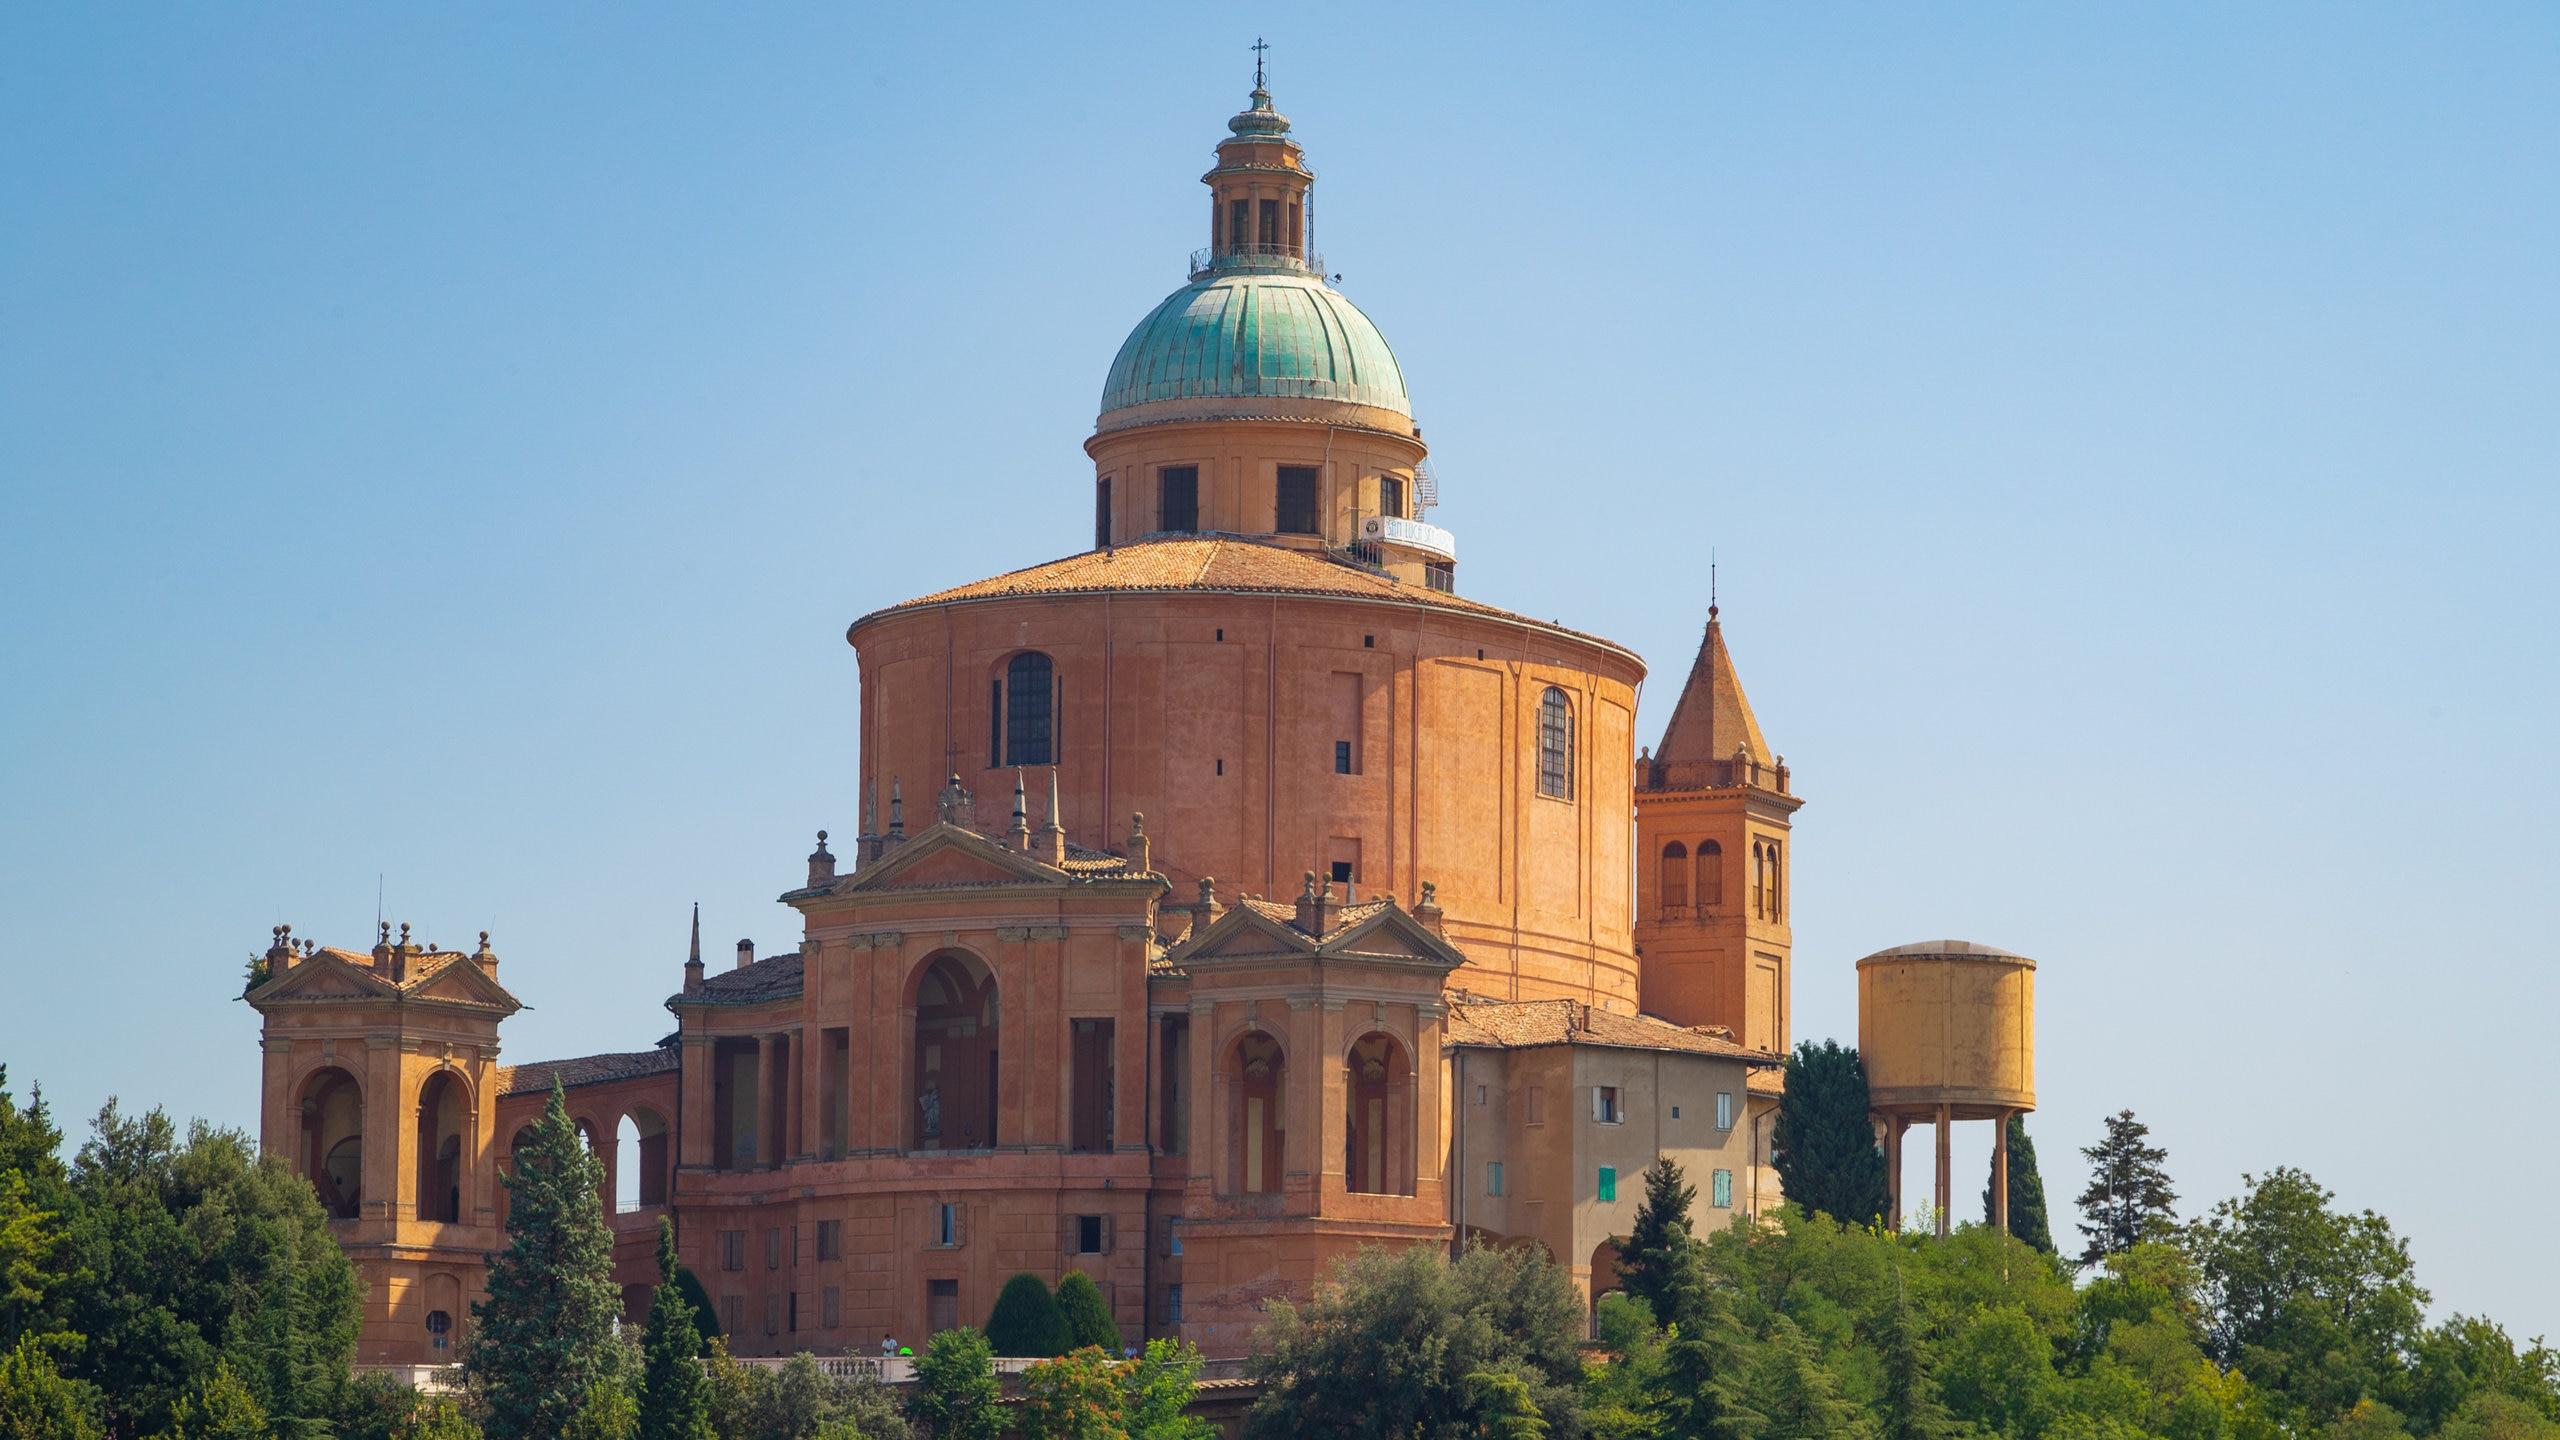 Saragozza-Porto, Bologna, Emilia-Romagna, Italy